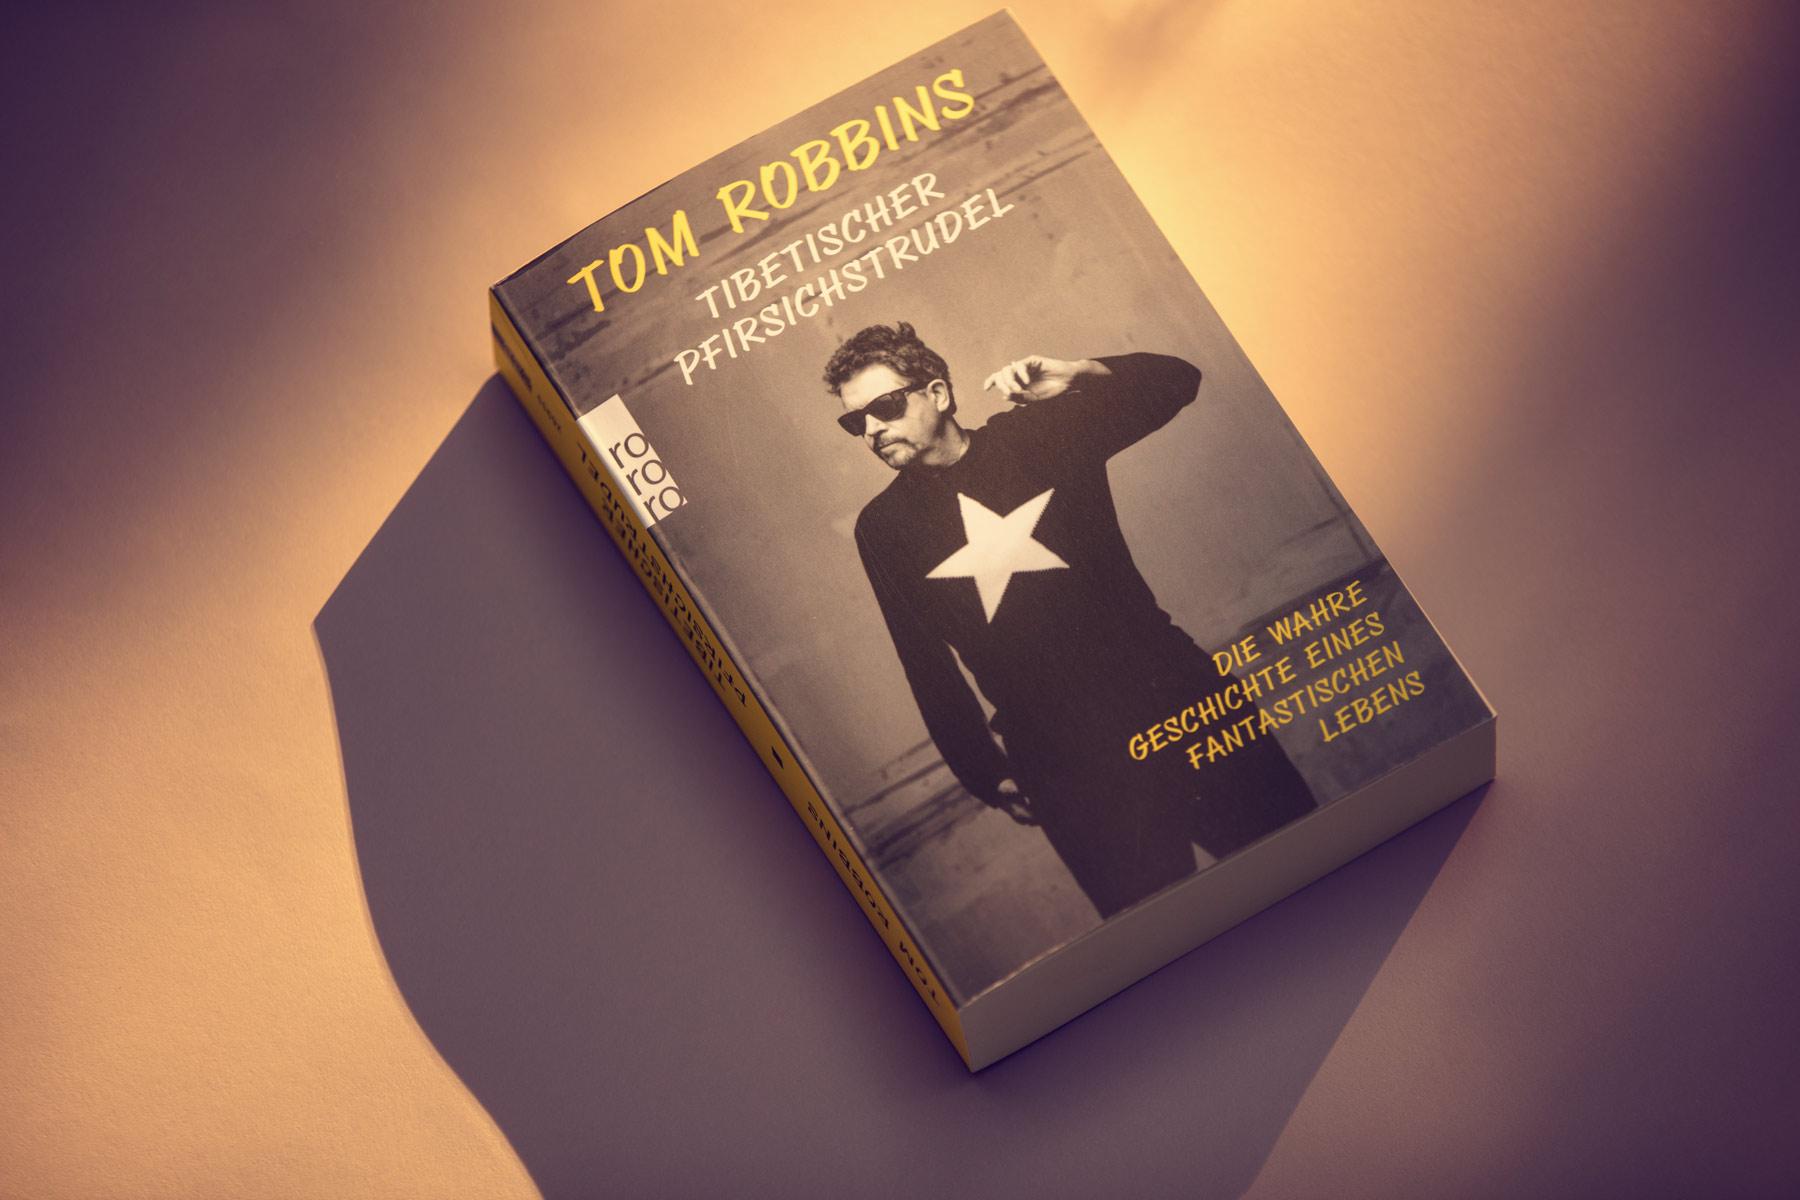 Tom Robbins - book